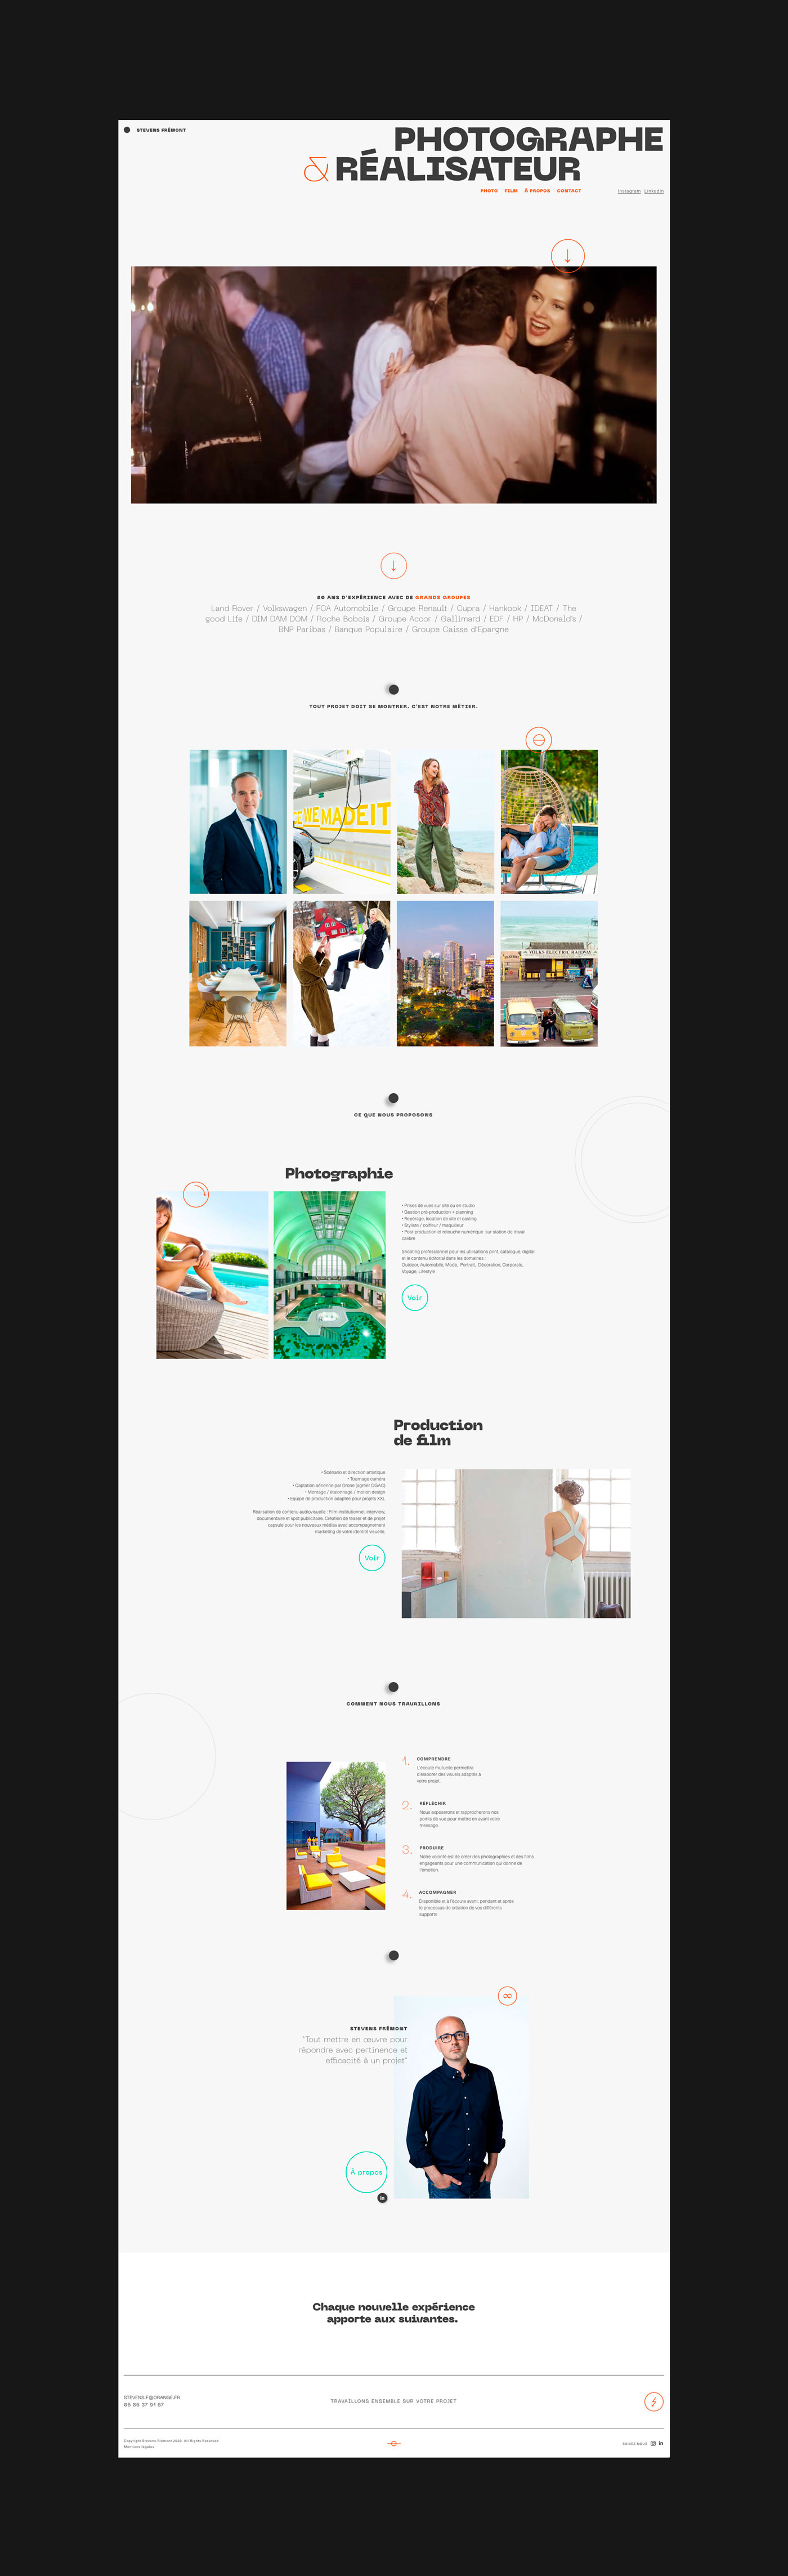 webdesigner webflow photographie film